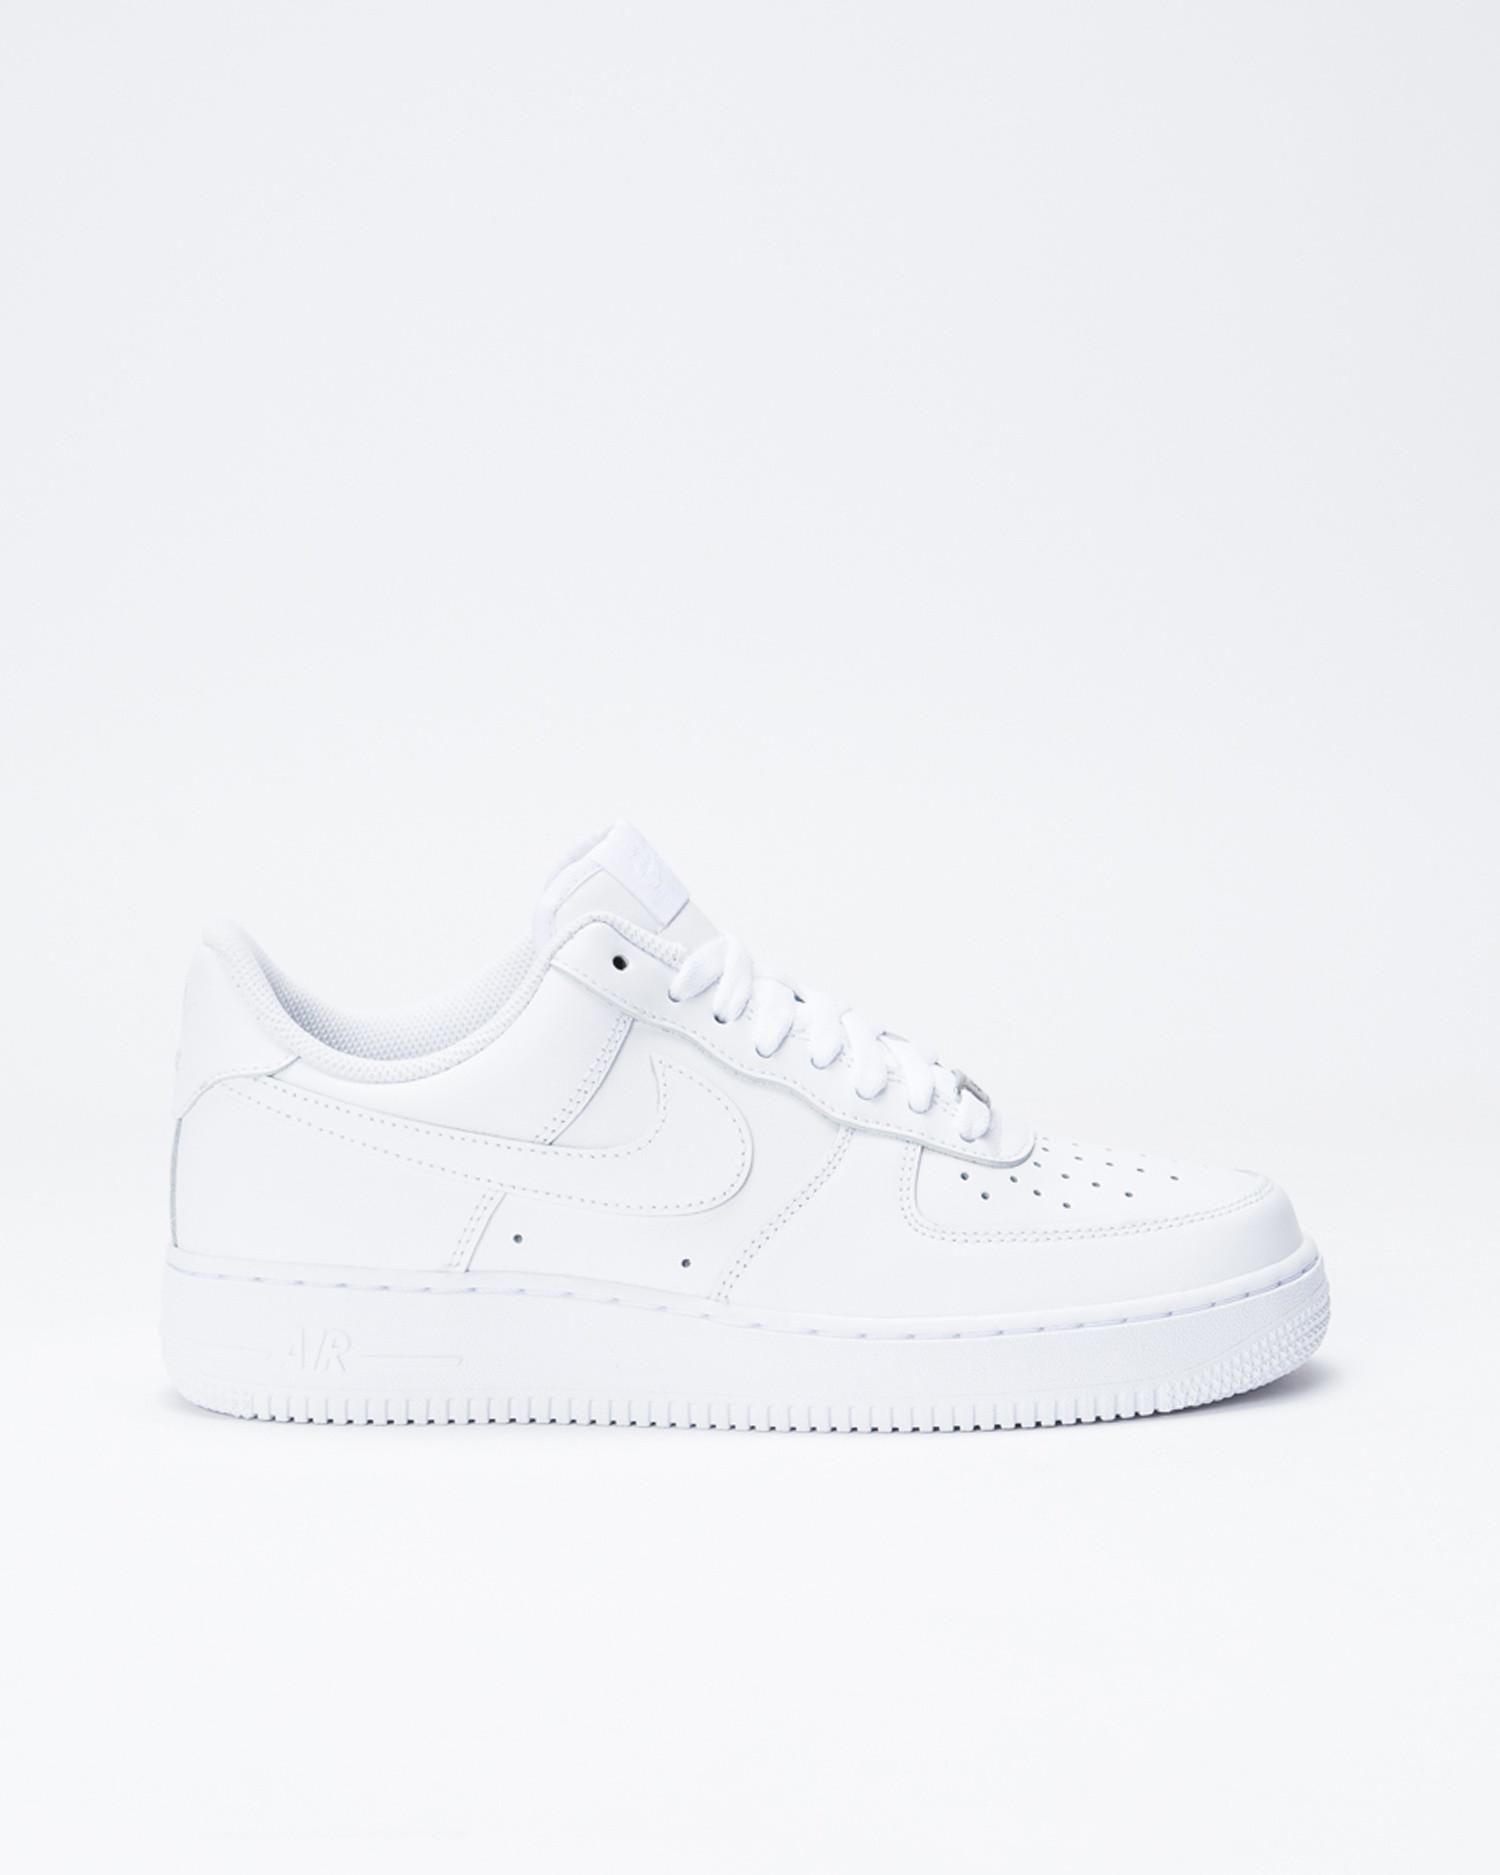 Nike Women's Nike Air Force 1 '07 Shoe white/white